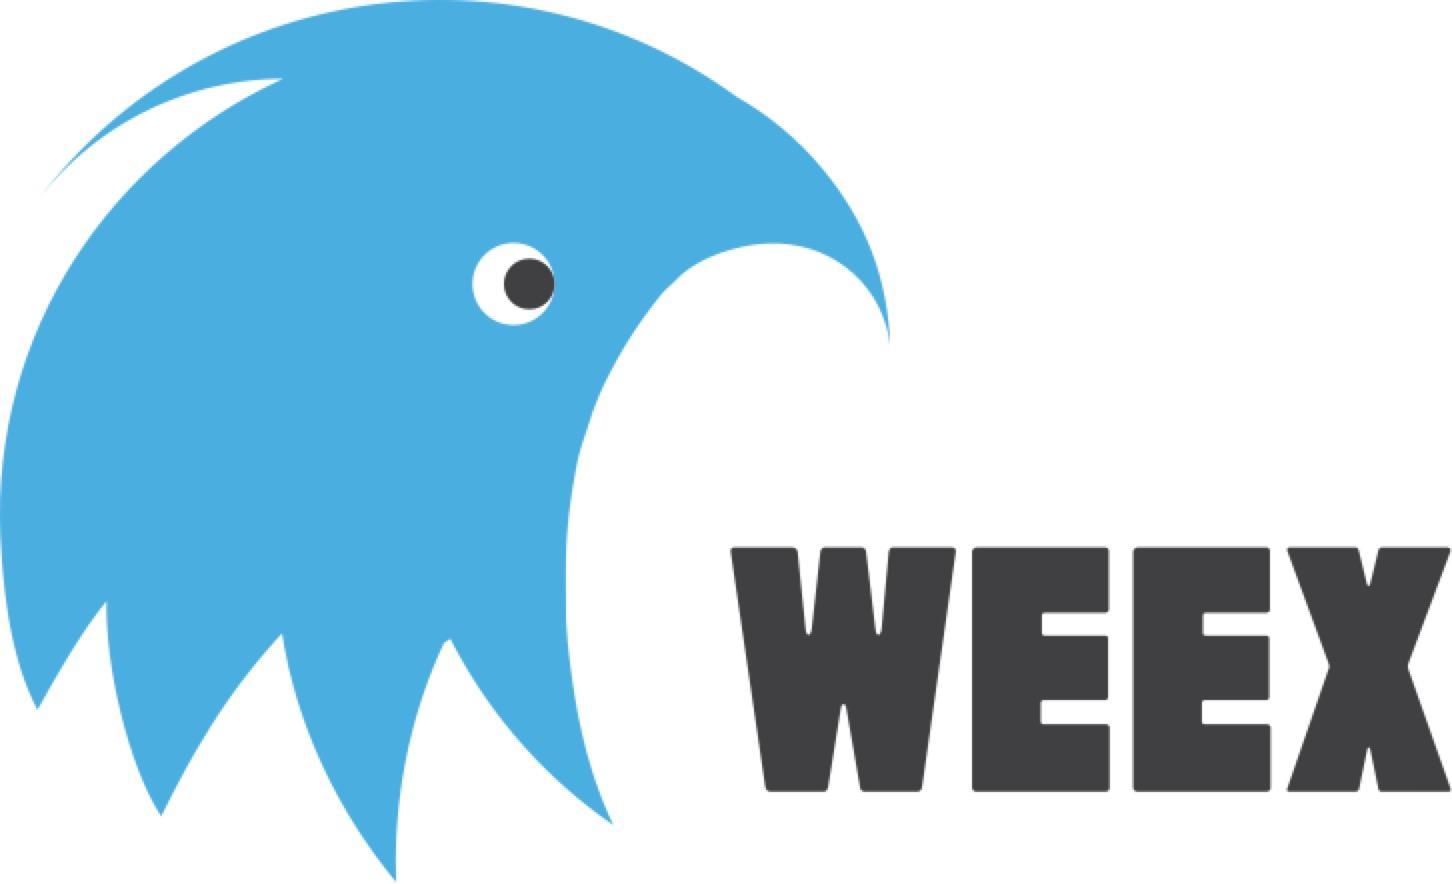 Weex 入坑指南:快速开始 Weex 之旅